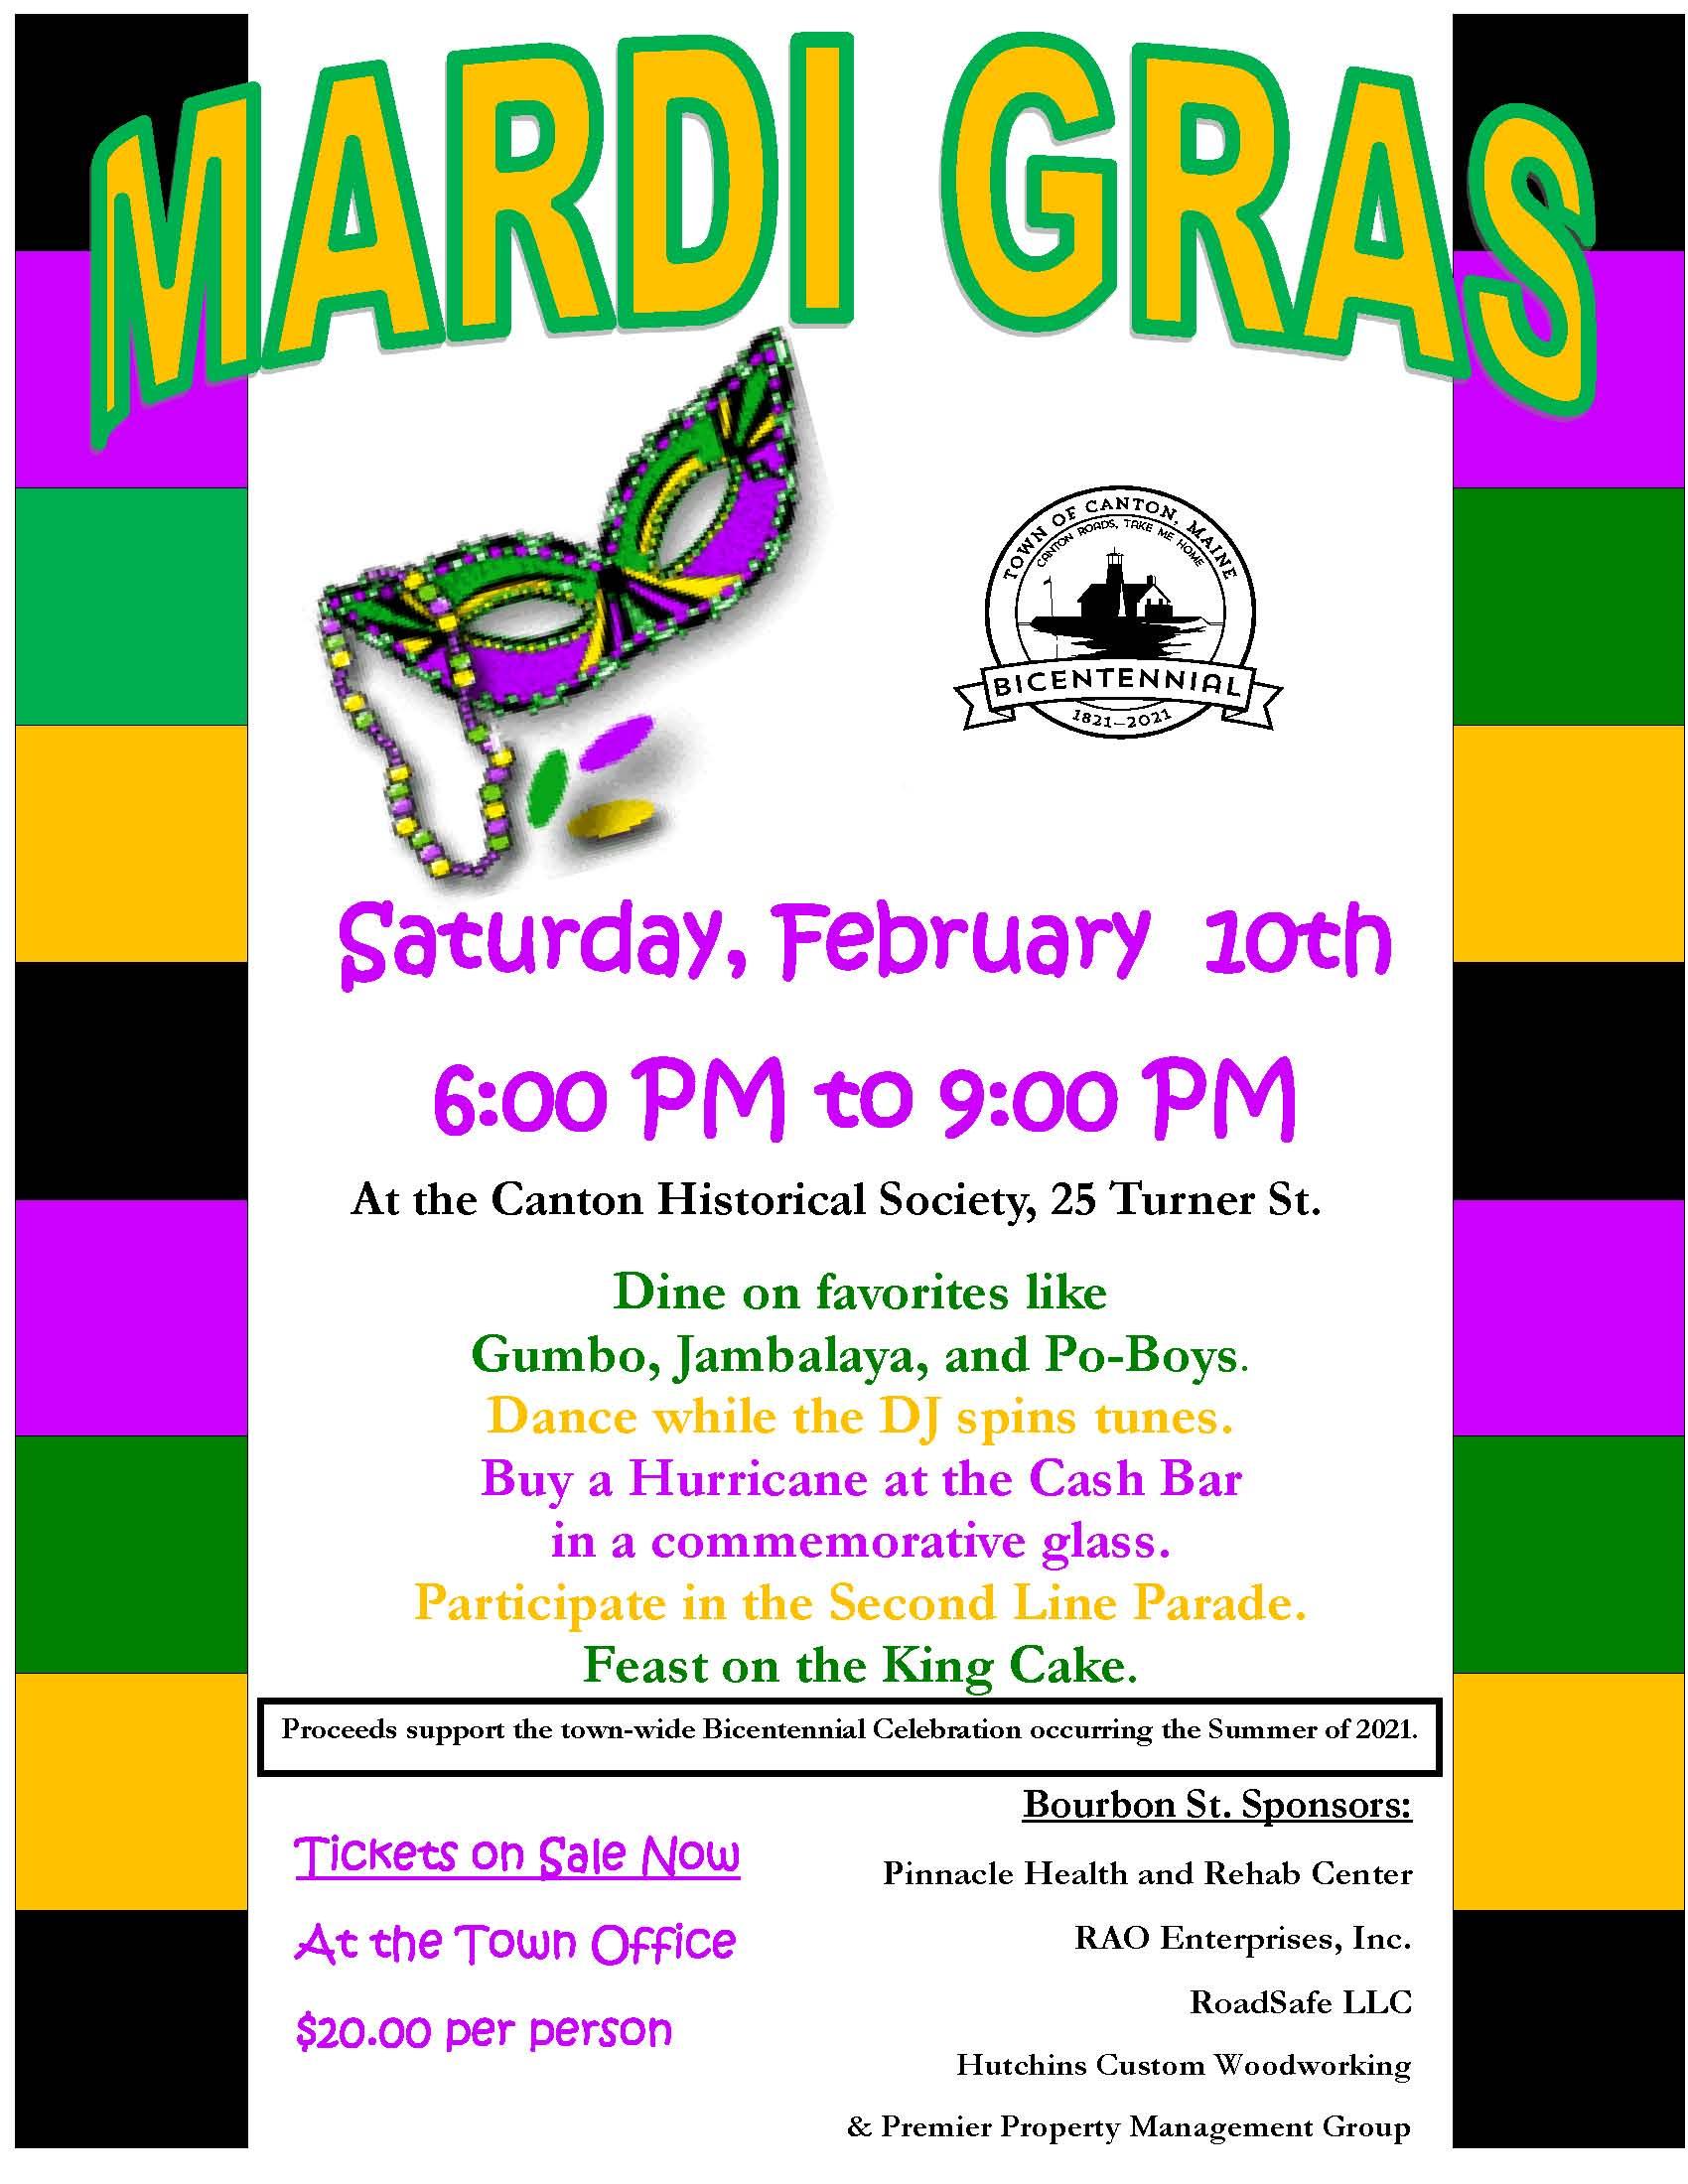 Mardi Gras Poster 2.jpg